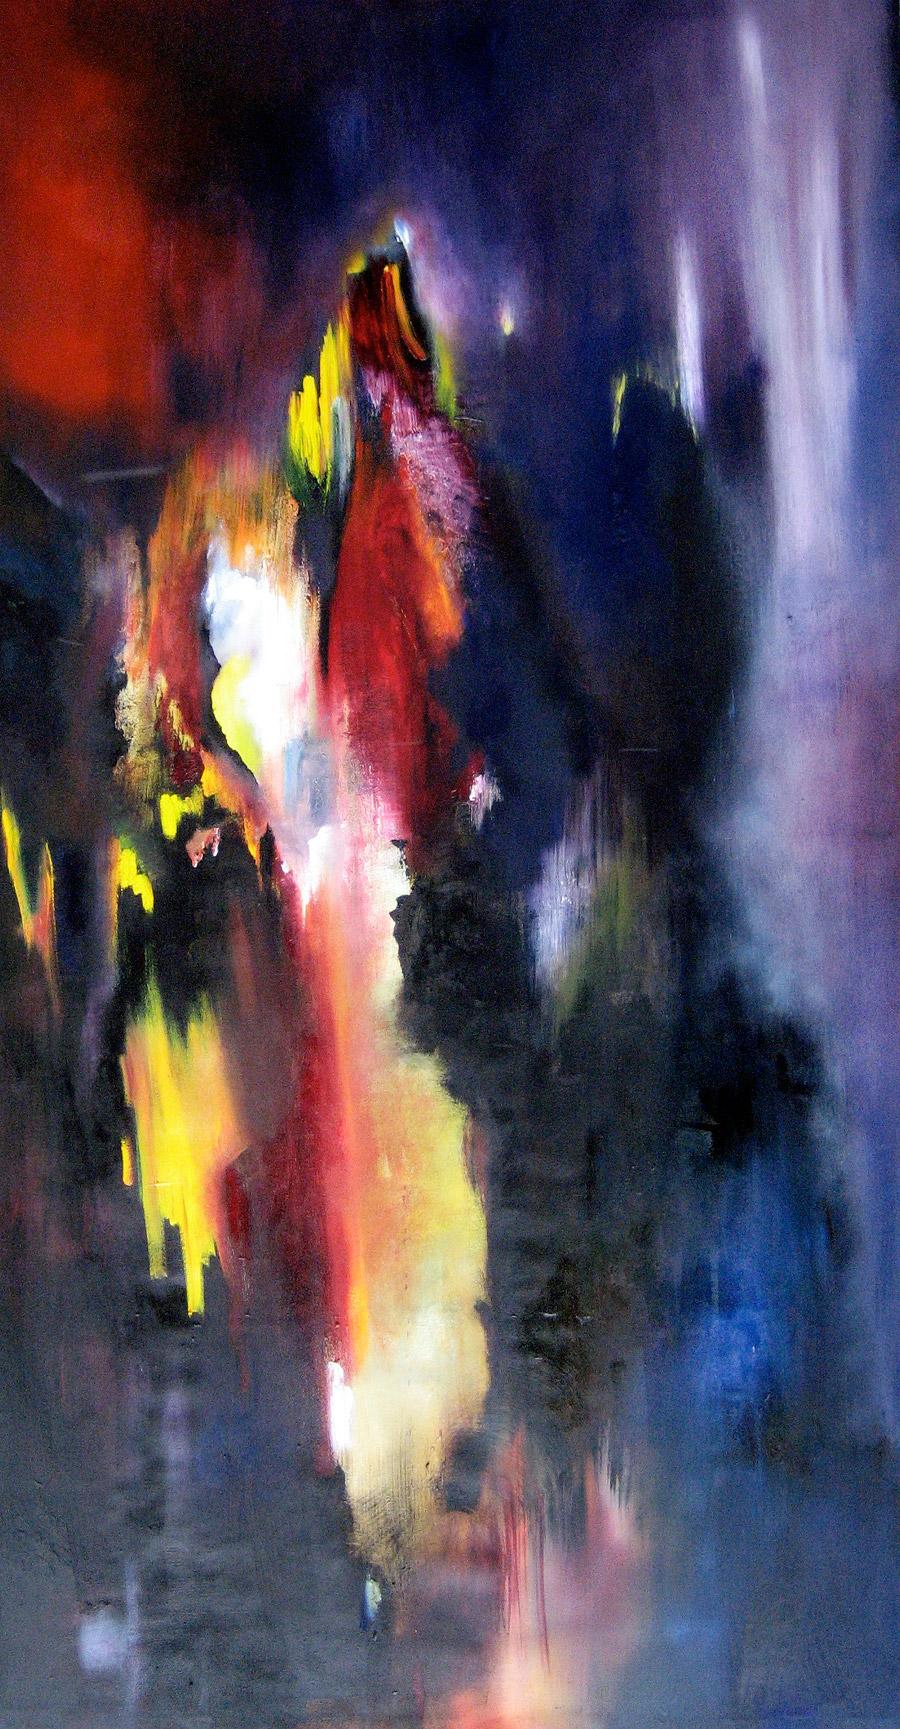 Mahler VI - Painting by Paula Arciniega